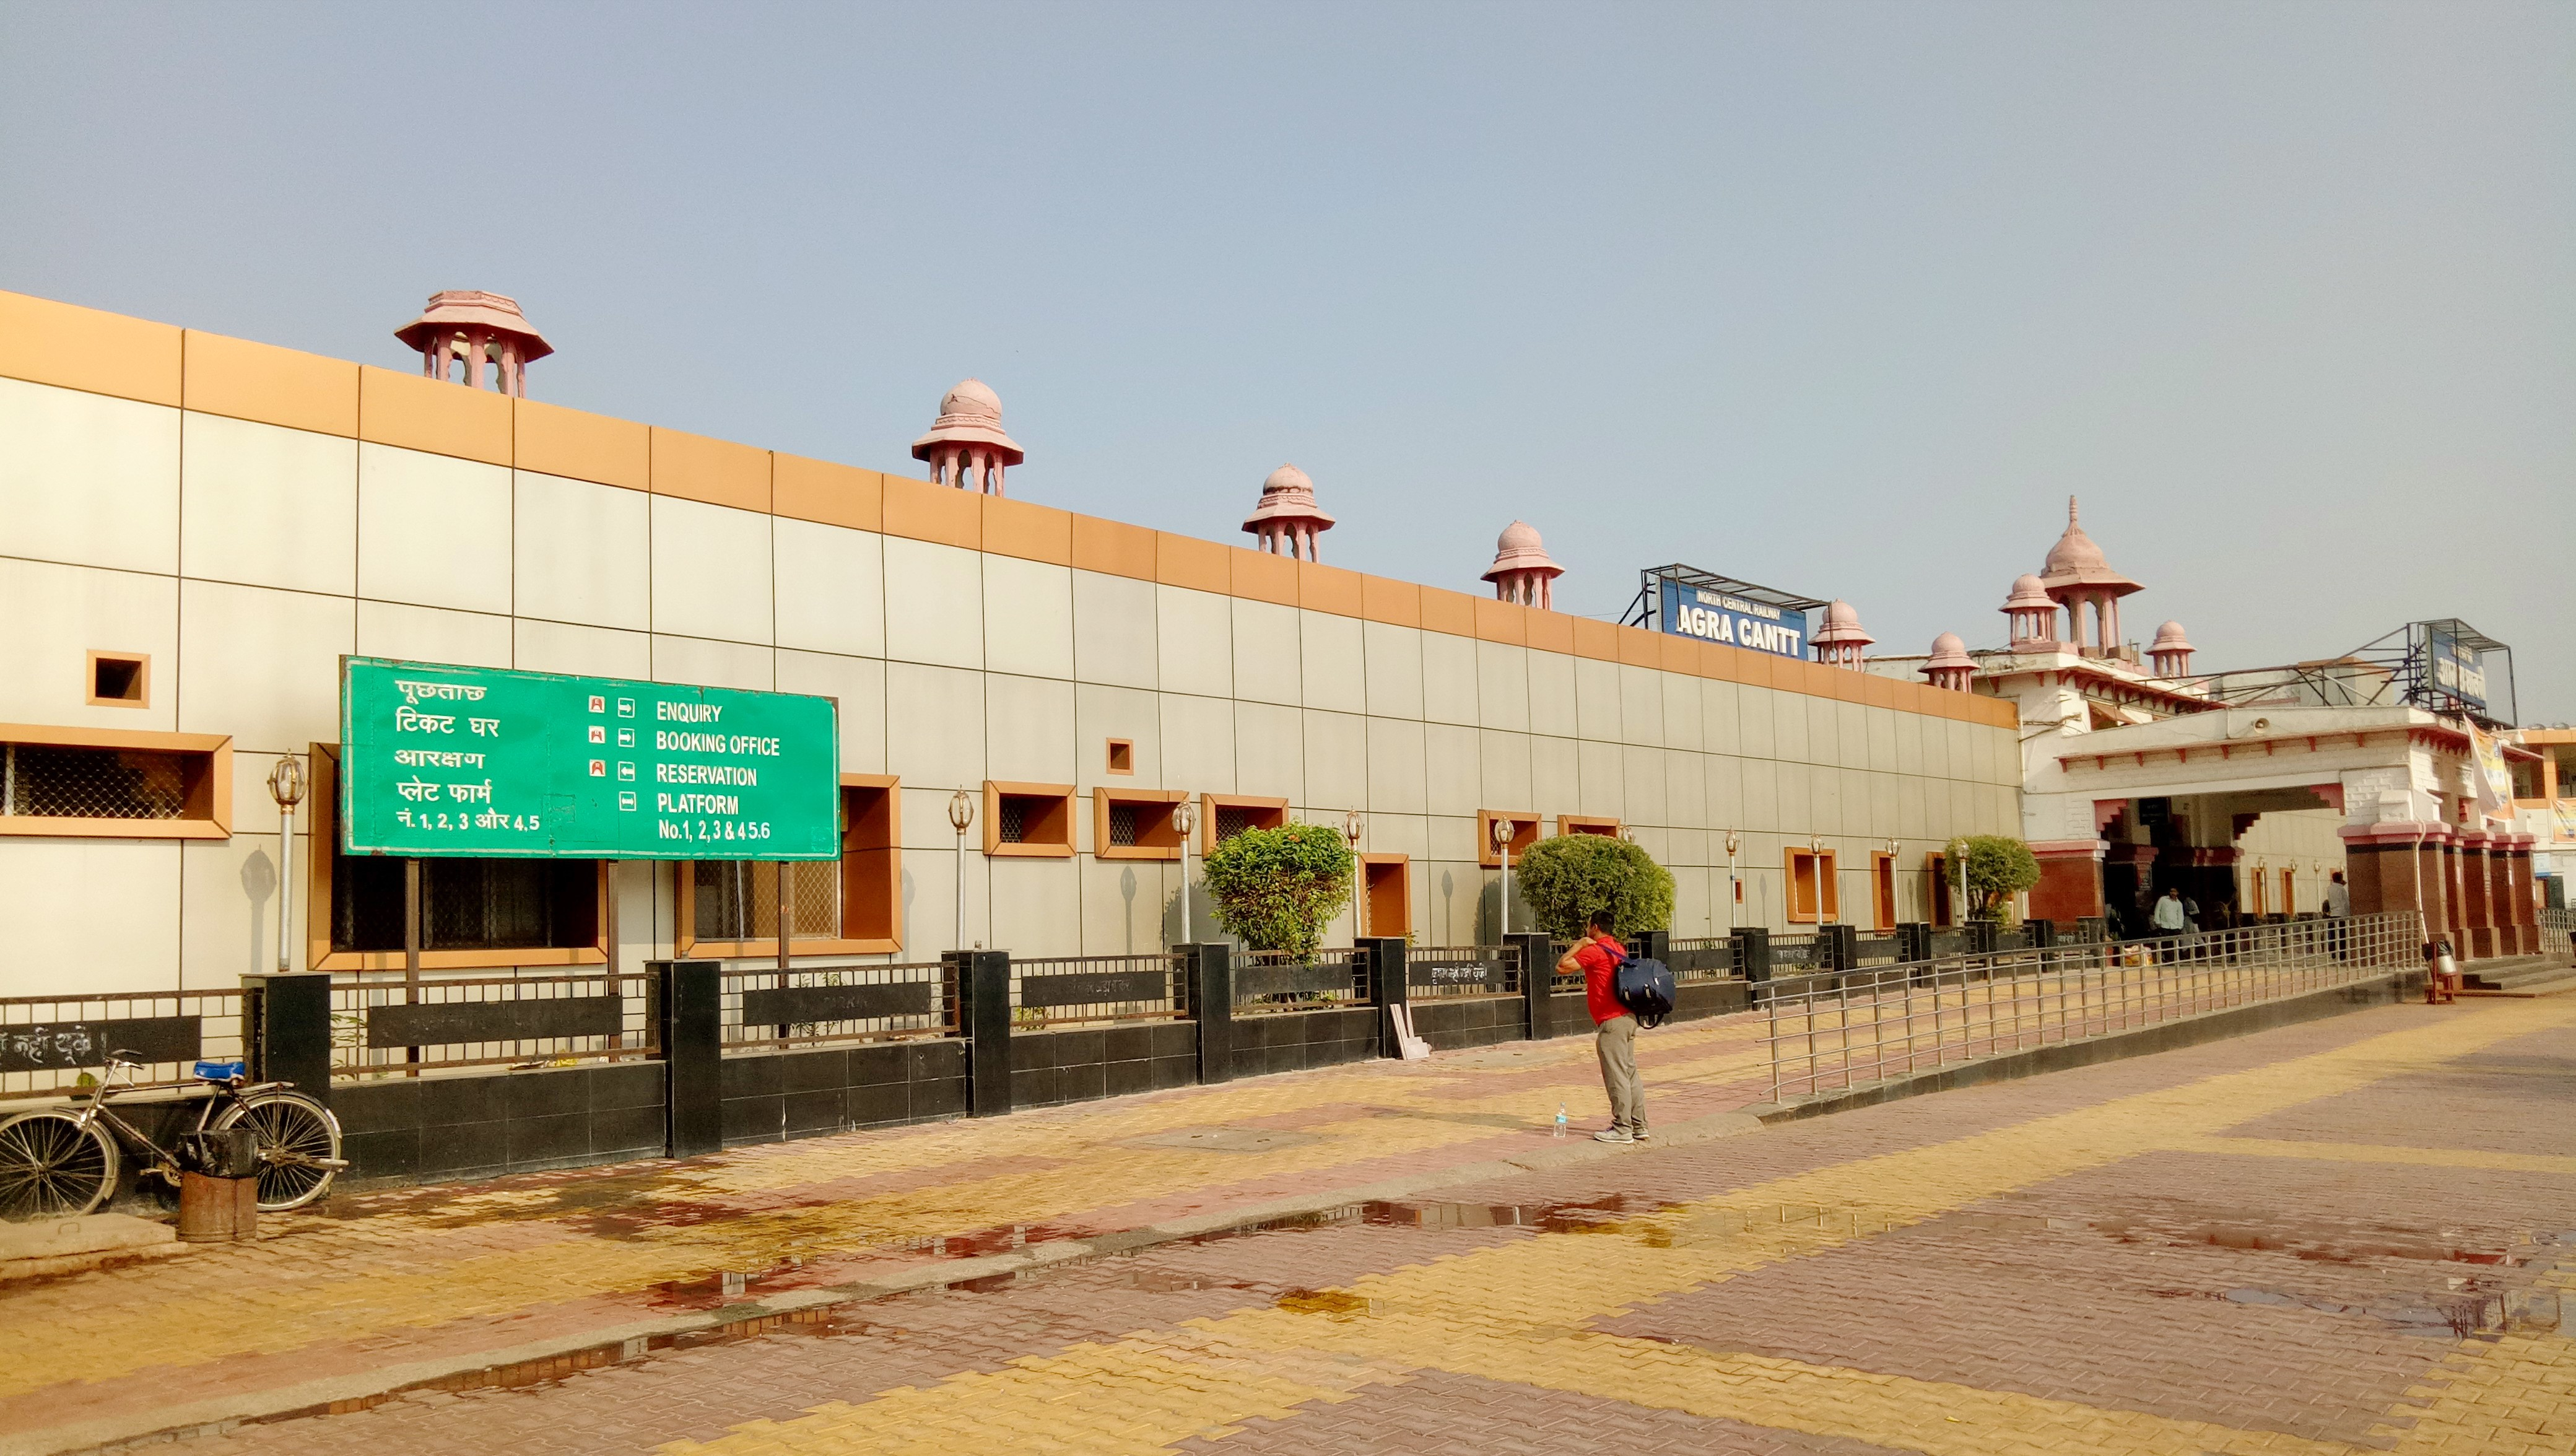 Agra Cantonment railway station - Wikipedia